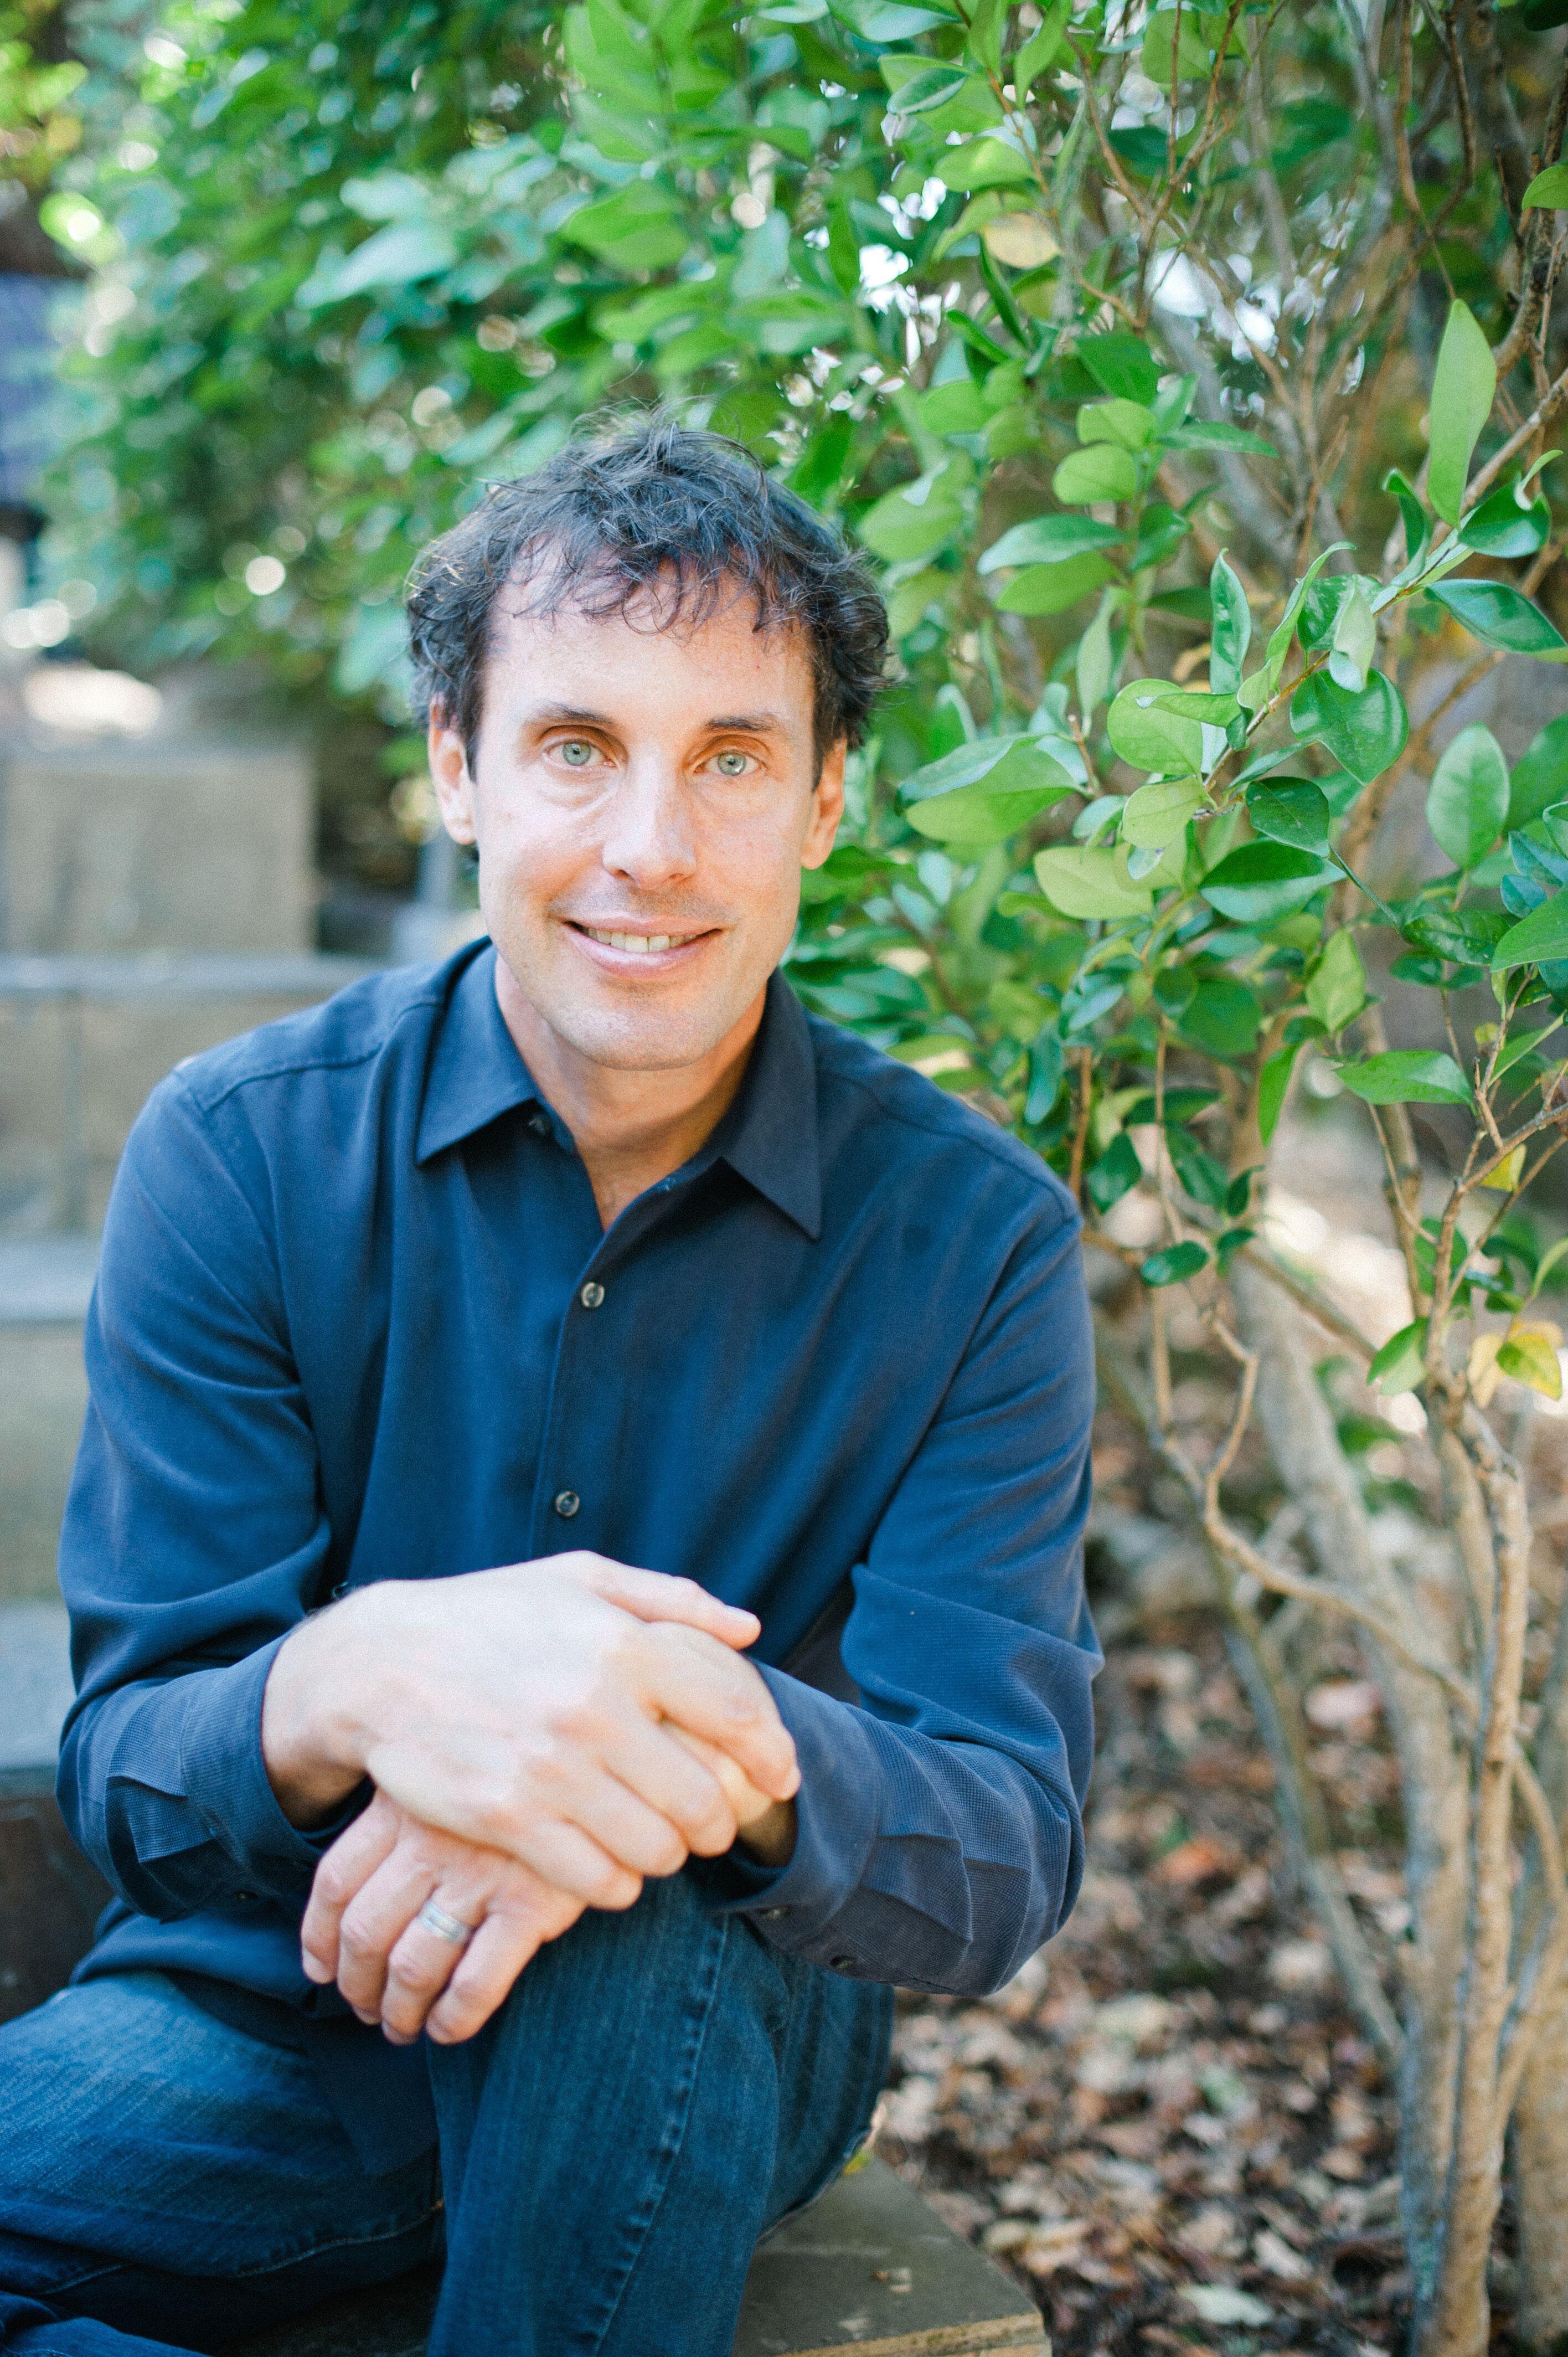 Jason Donahue, Chief Executive Officer, Cloudmark, Inc. (Photo: Business Wire)